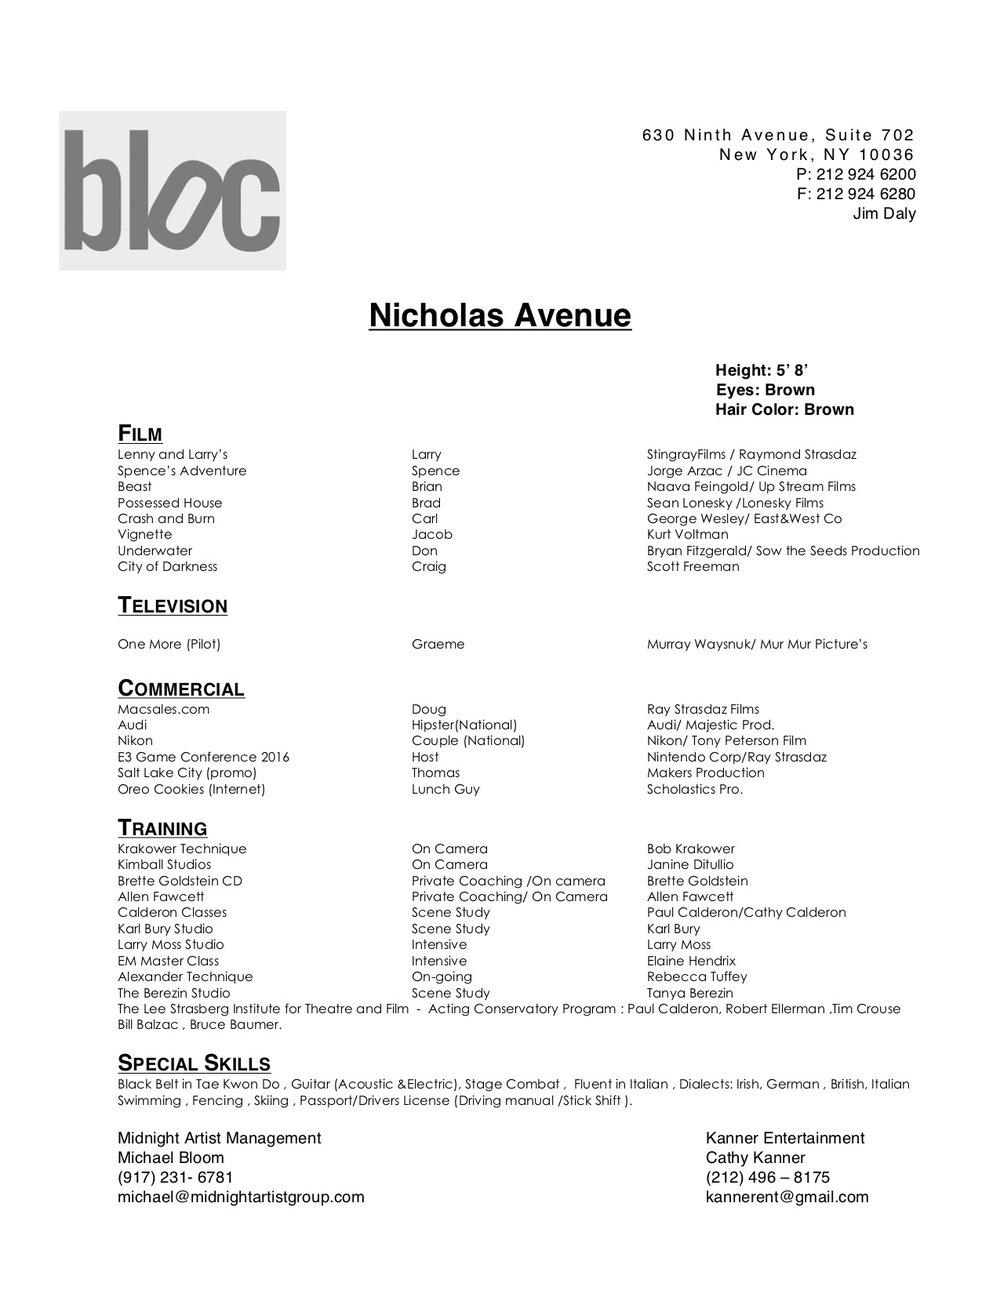 Nicholas Avenue Resume 2017 .jpg